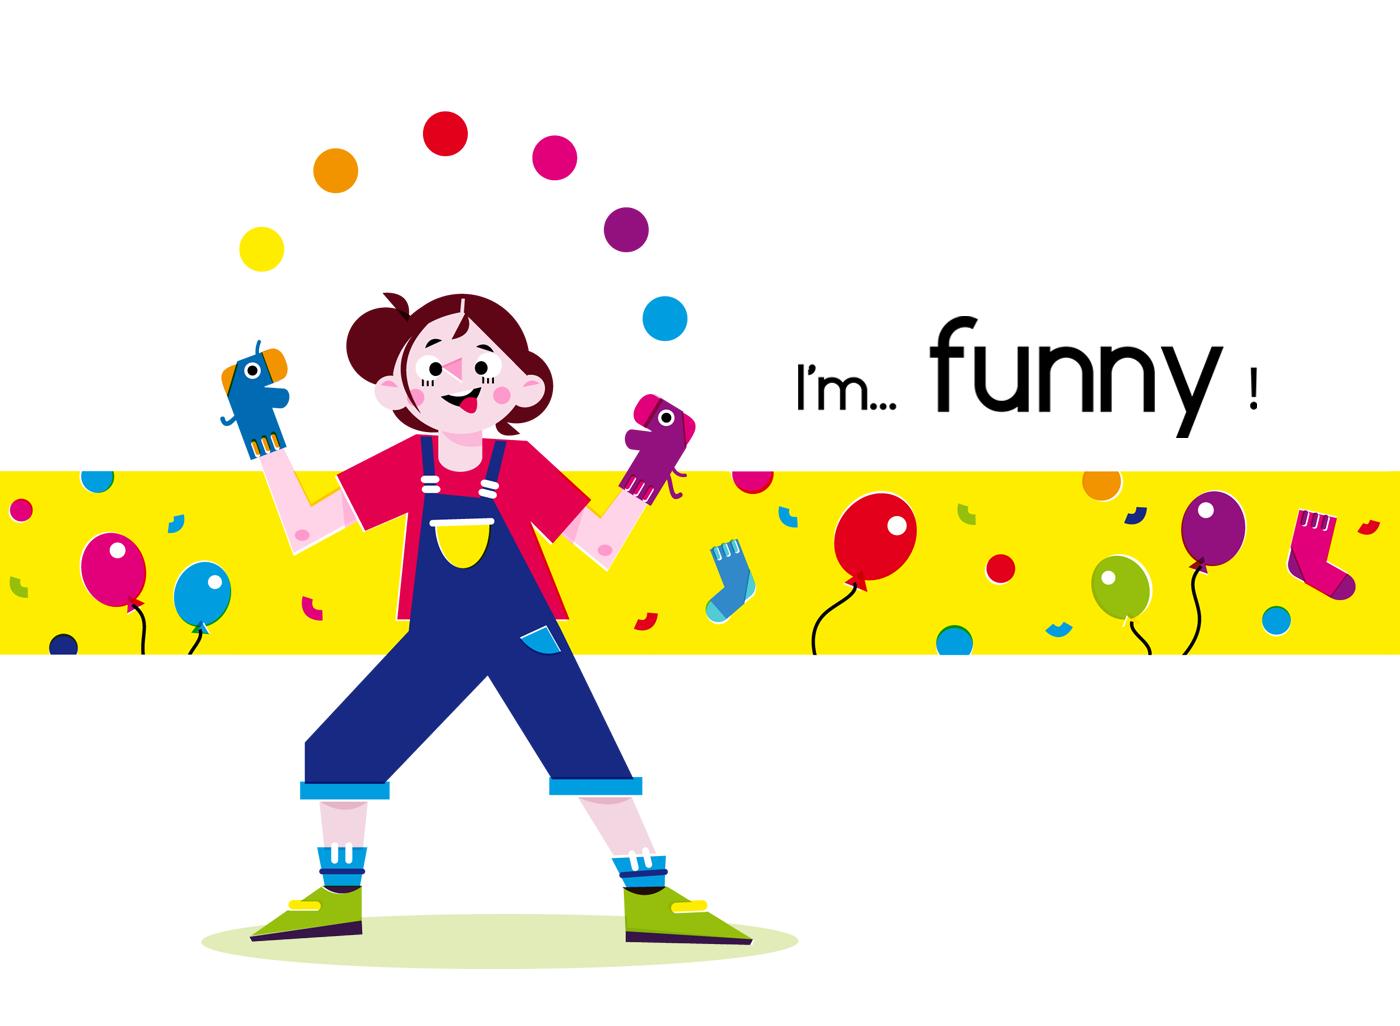 Funny - Vector Illustration © Emeline Barrea, All rights reserved